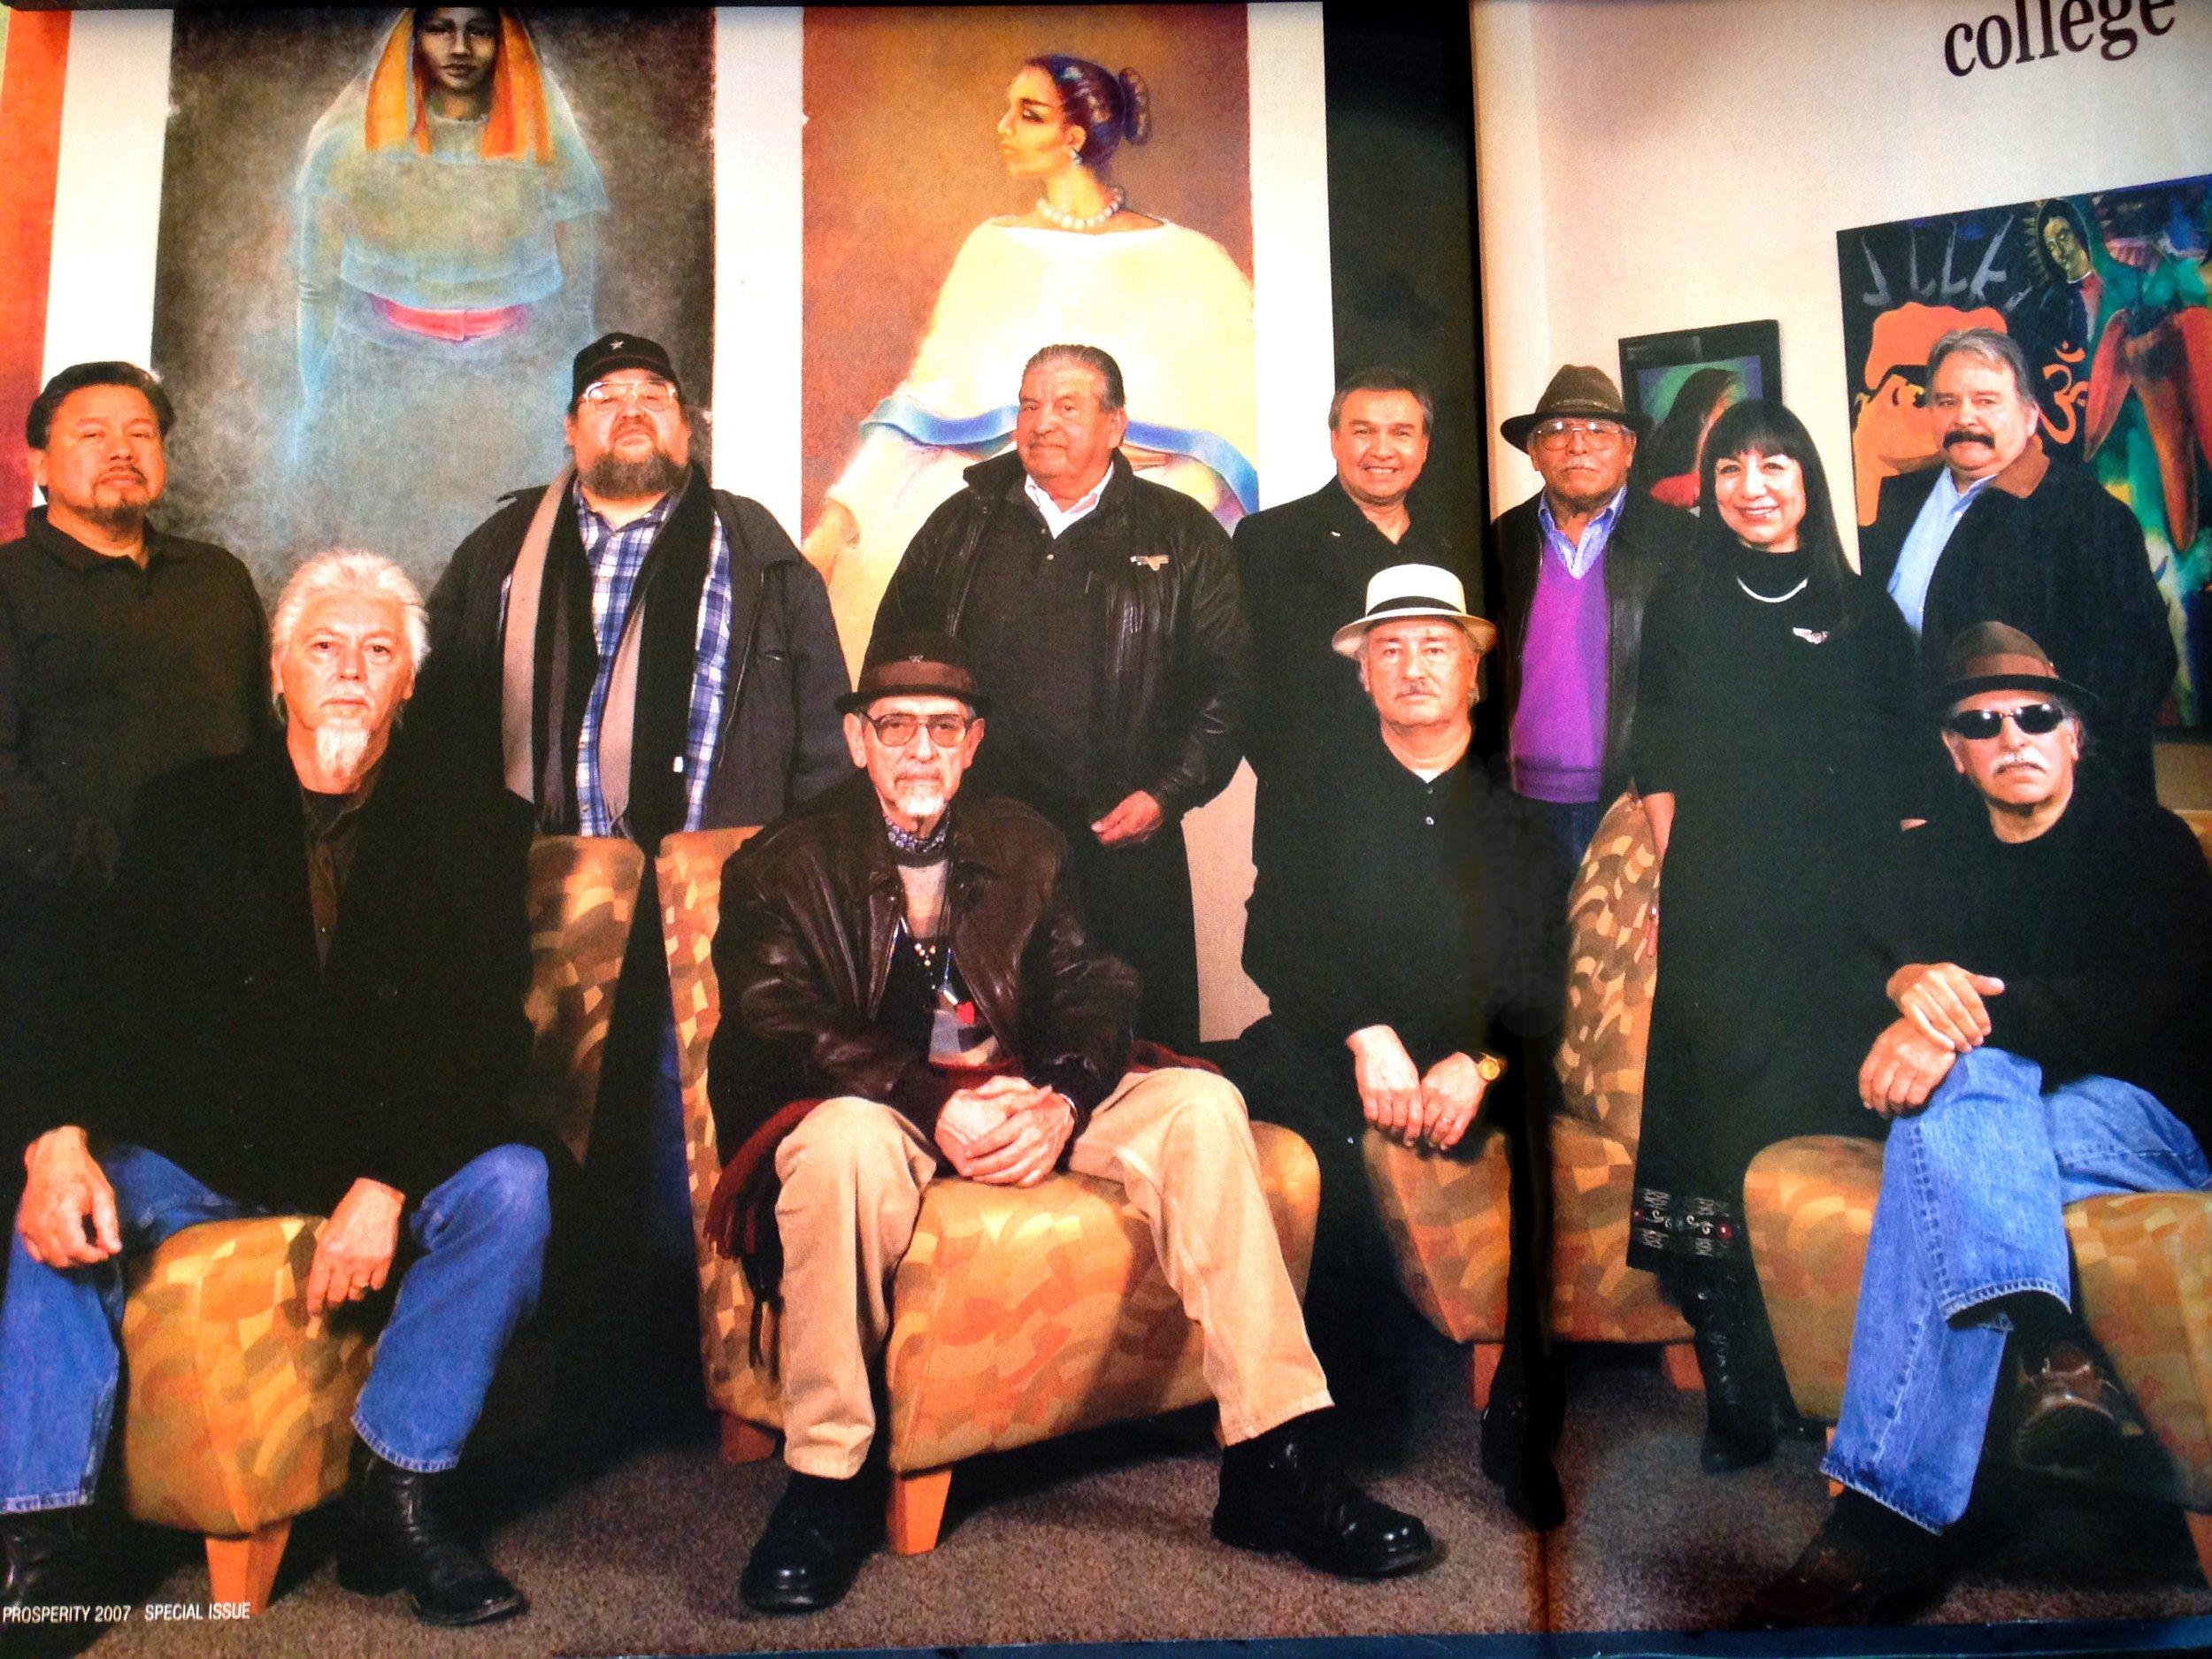 RCAF Artists Left to right: Juan Cervantes, Stan Padilla, Ricardo Fabela, José Montoya, Esteban Villa, Juan Carillo, Rudy Cuellar, Sam Quiñonez, Lorraine García-Nakata, Armando Cid, Juanishi Orosxo, 2007